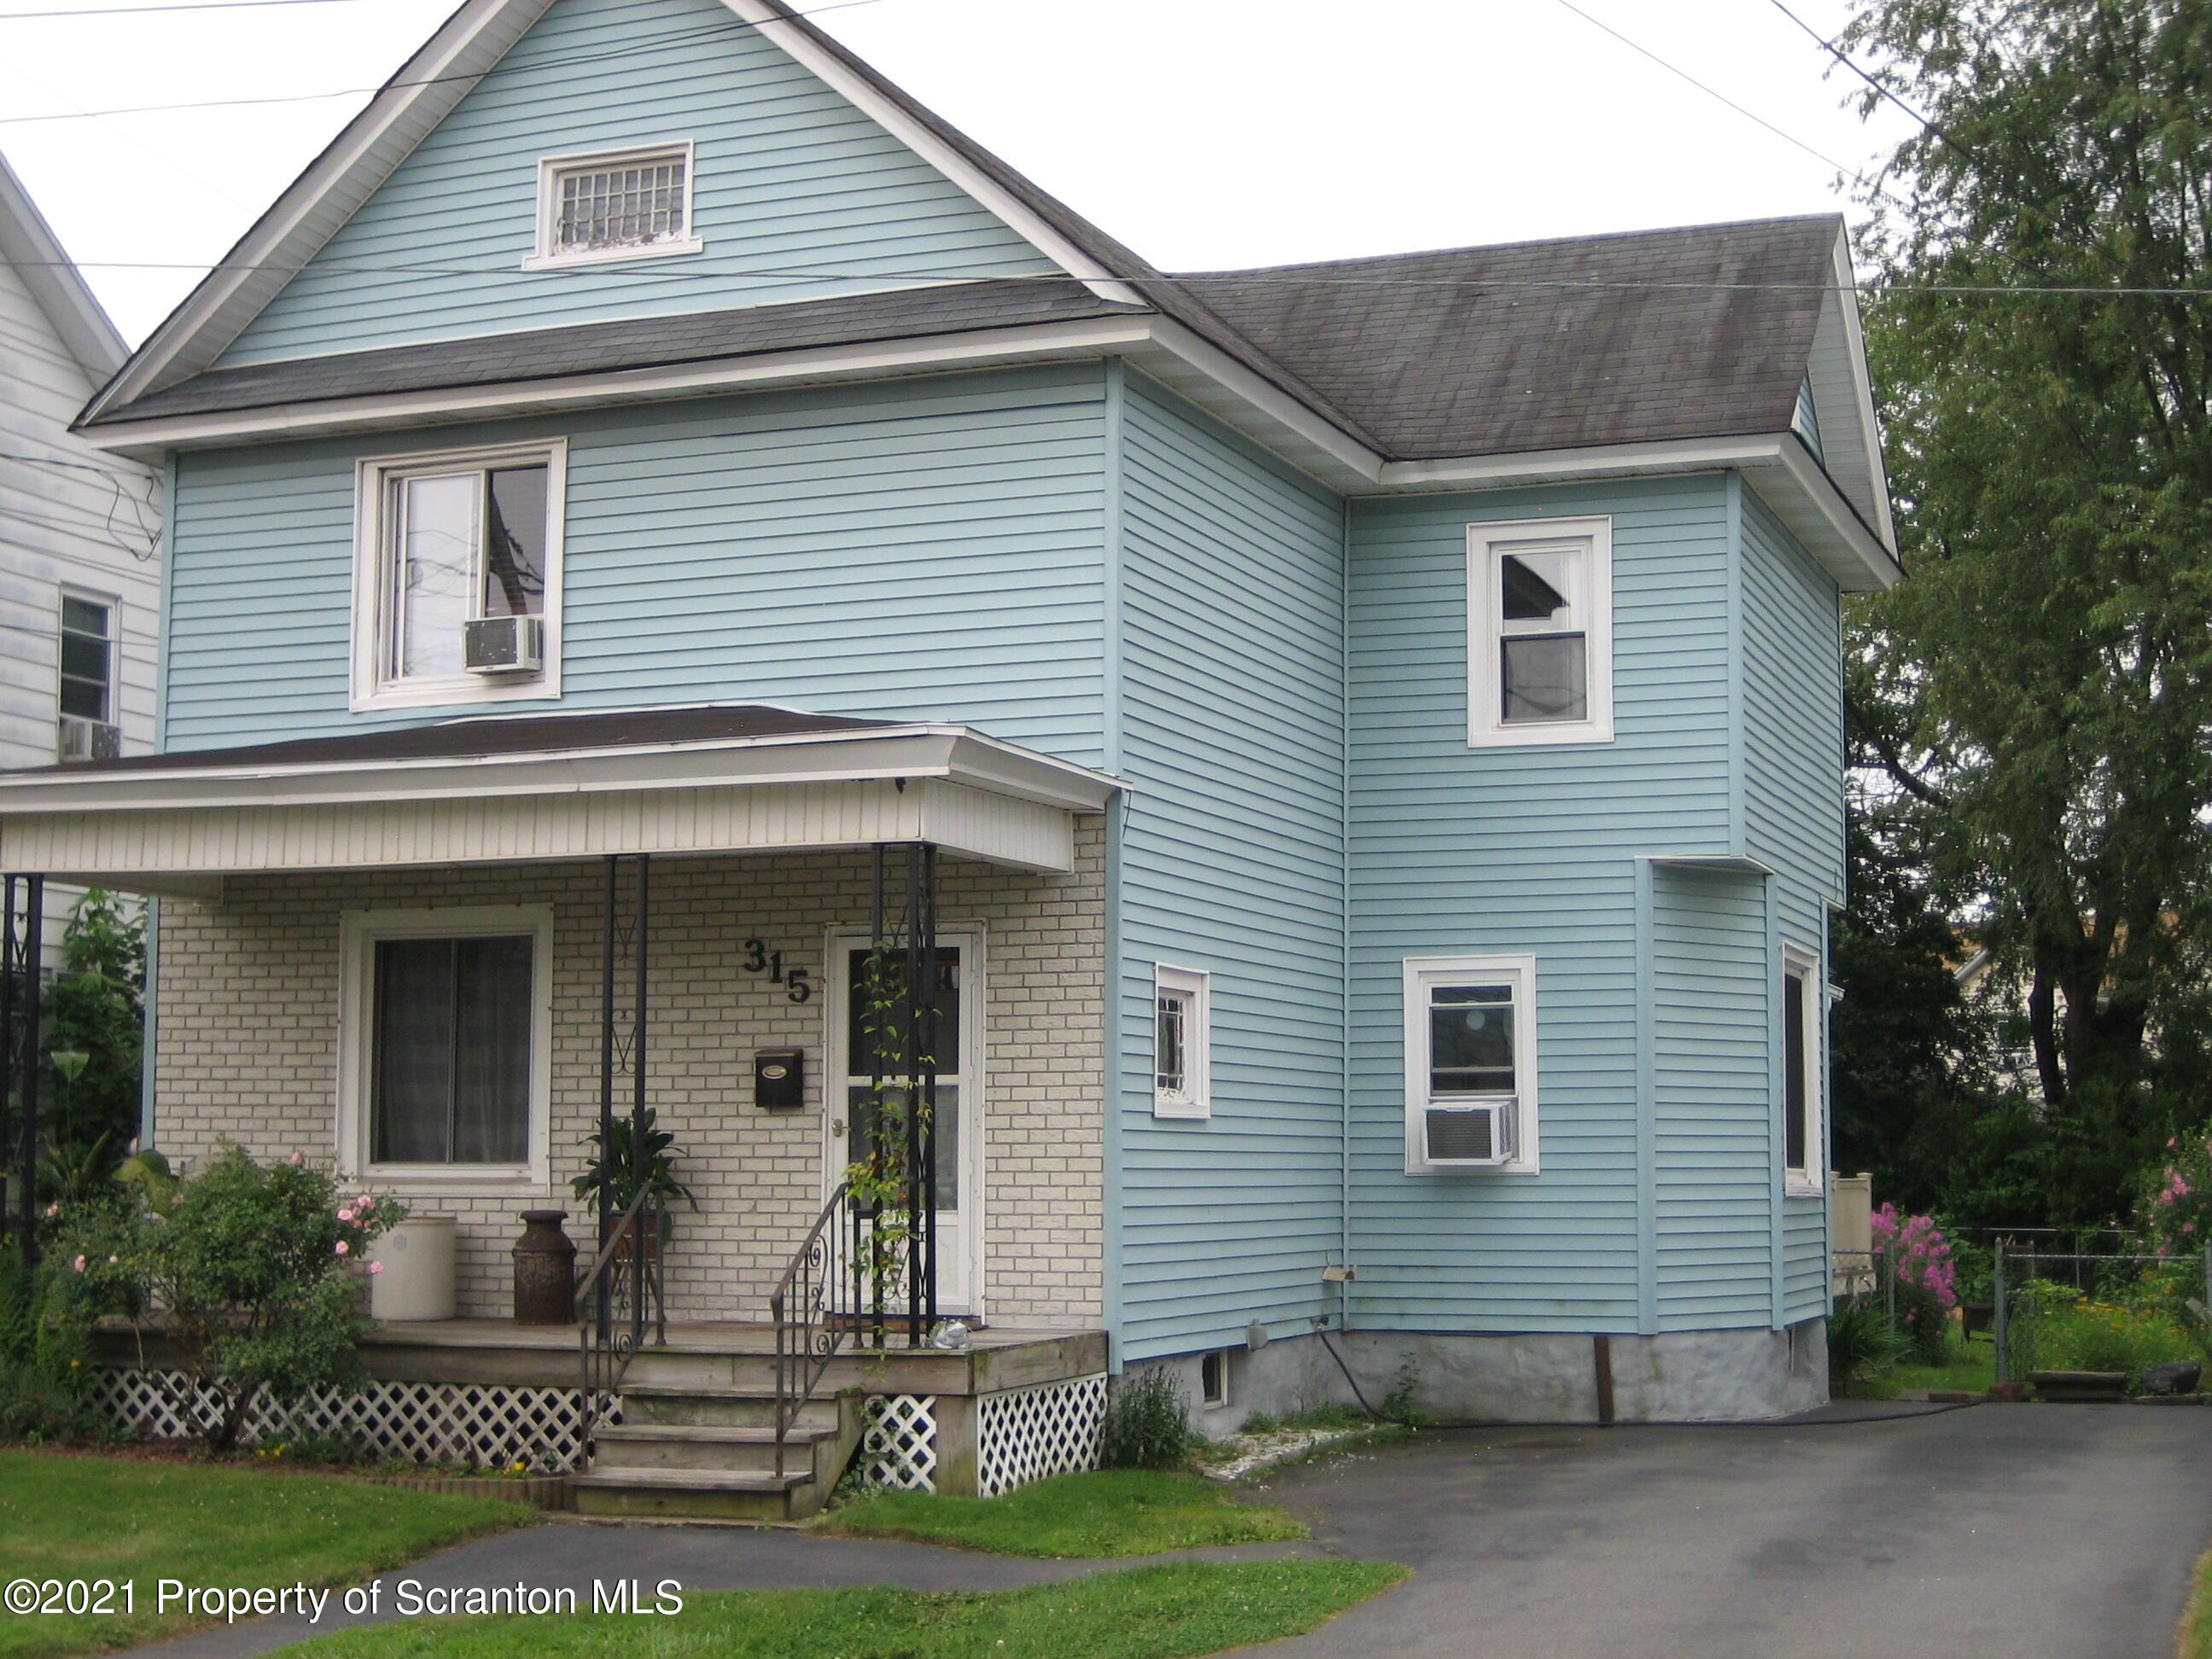 315 Keystone Ave, Peckville, Pennsylvania 18452, 3 Bedrooms Bedrooms, 7 Rooms Rooms,2 BathroomsBathrooms,Single Family,For Sale,Keystone,21-3345